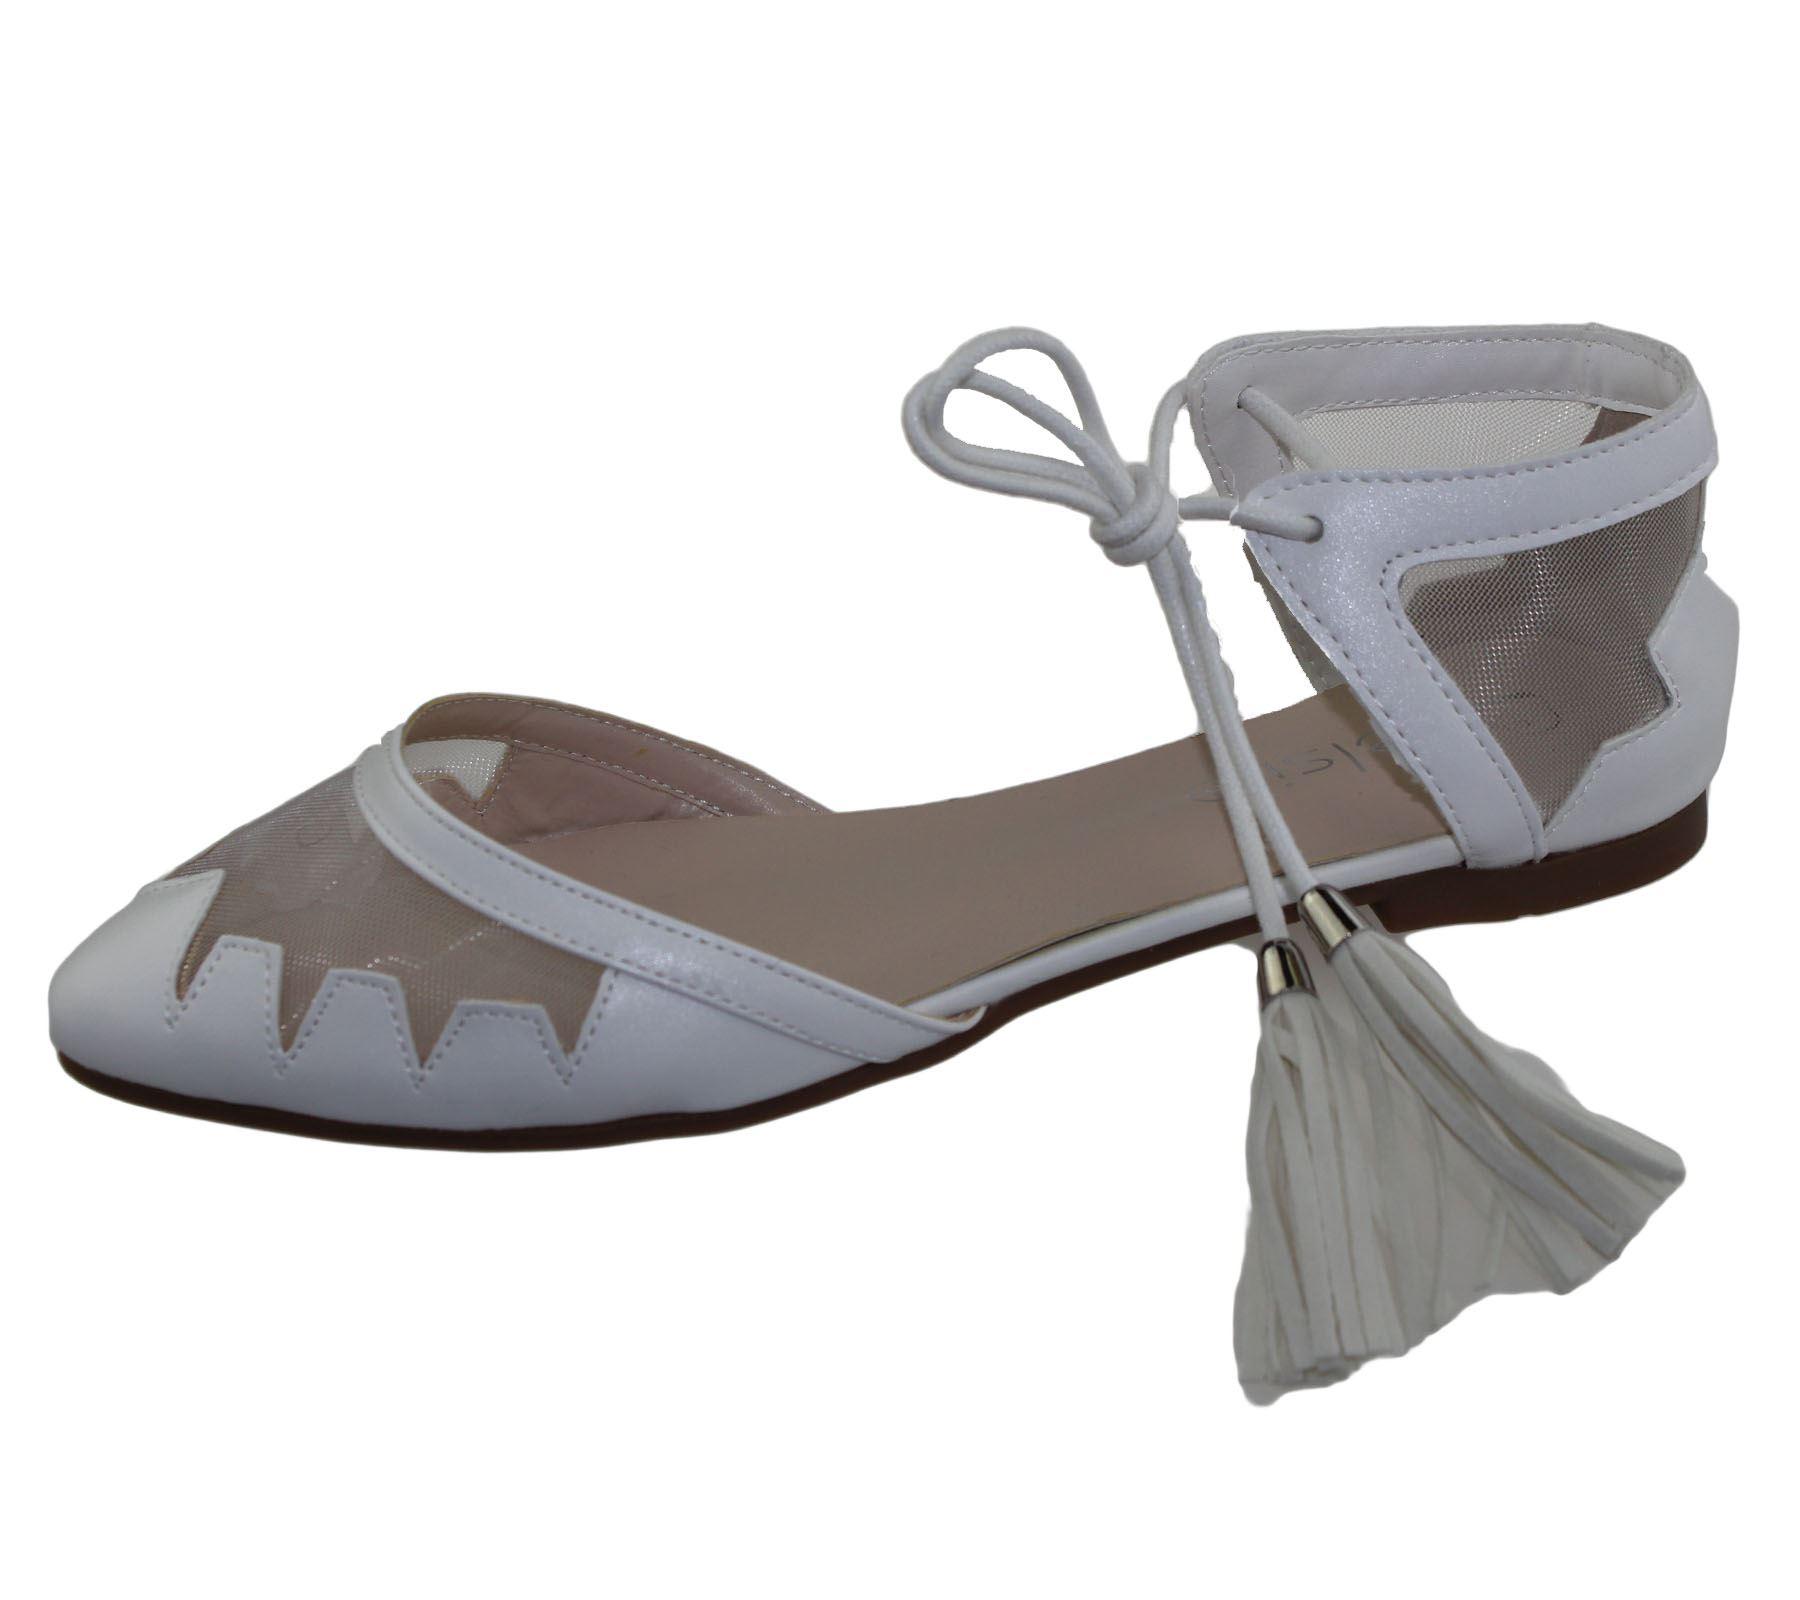 Womens-Flat-Ballerina-Dolly-Pumps-Ballet-Ladies-Summer-Mesh-Tassel-Shoes-Sandals thumbnail 17